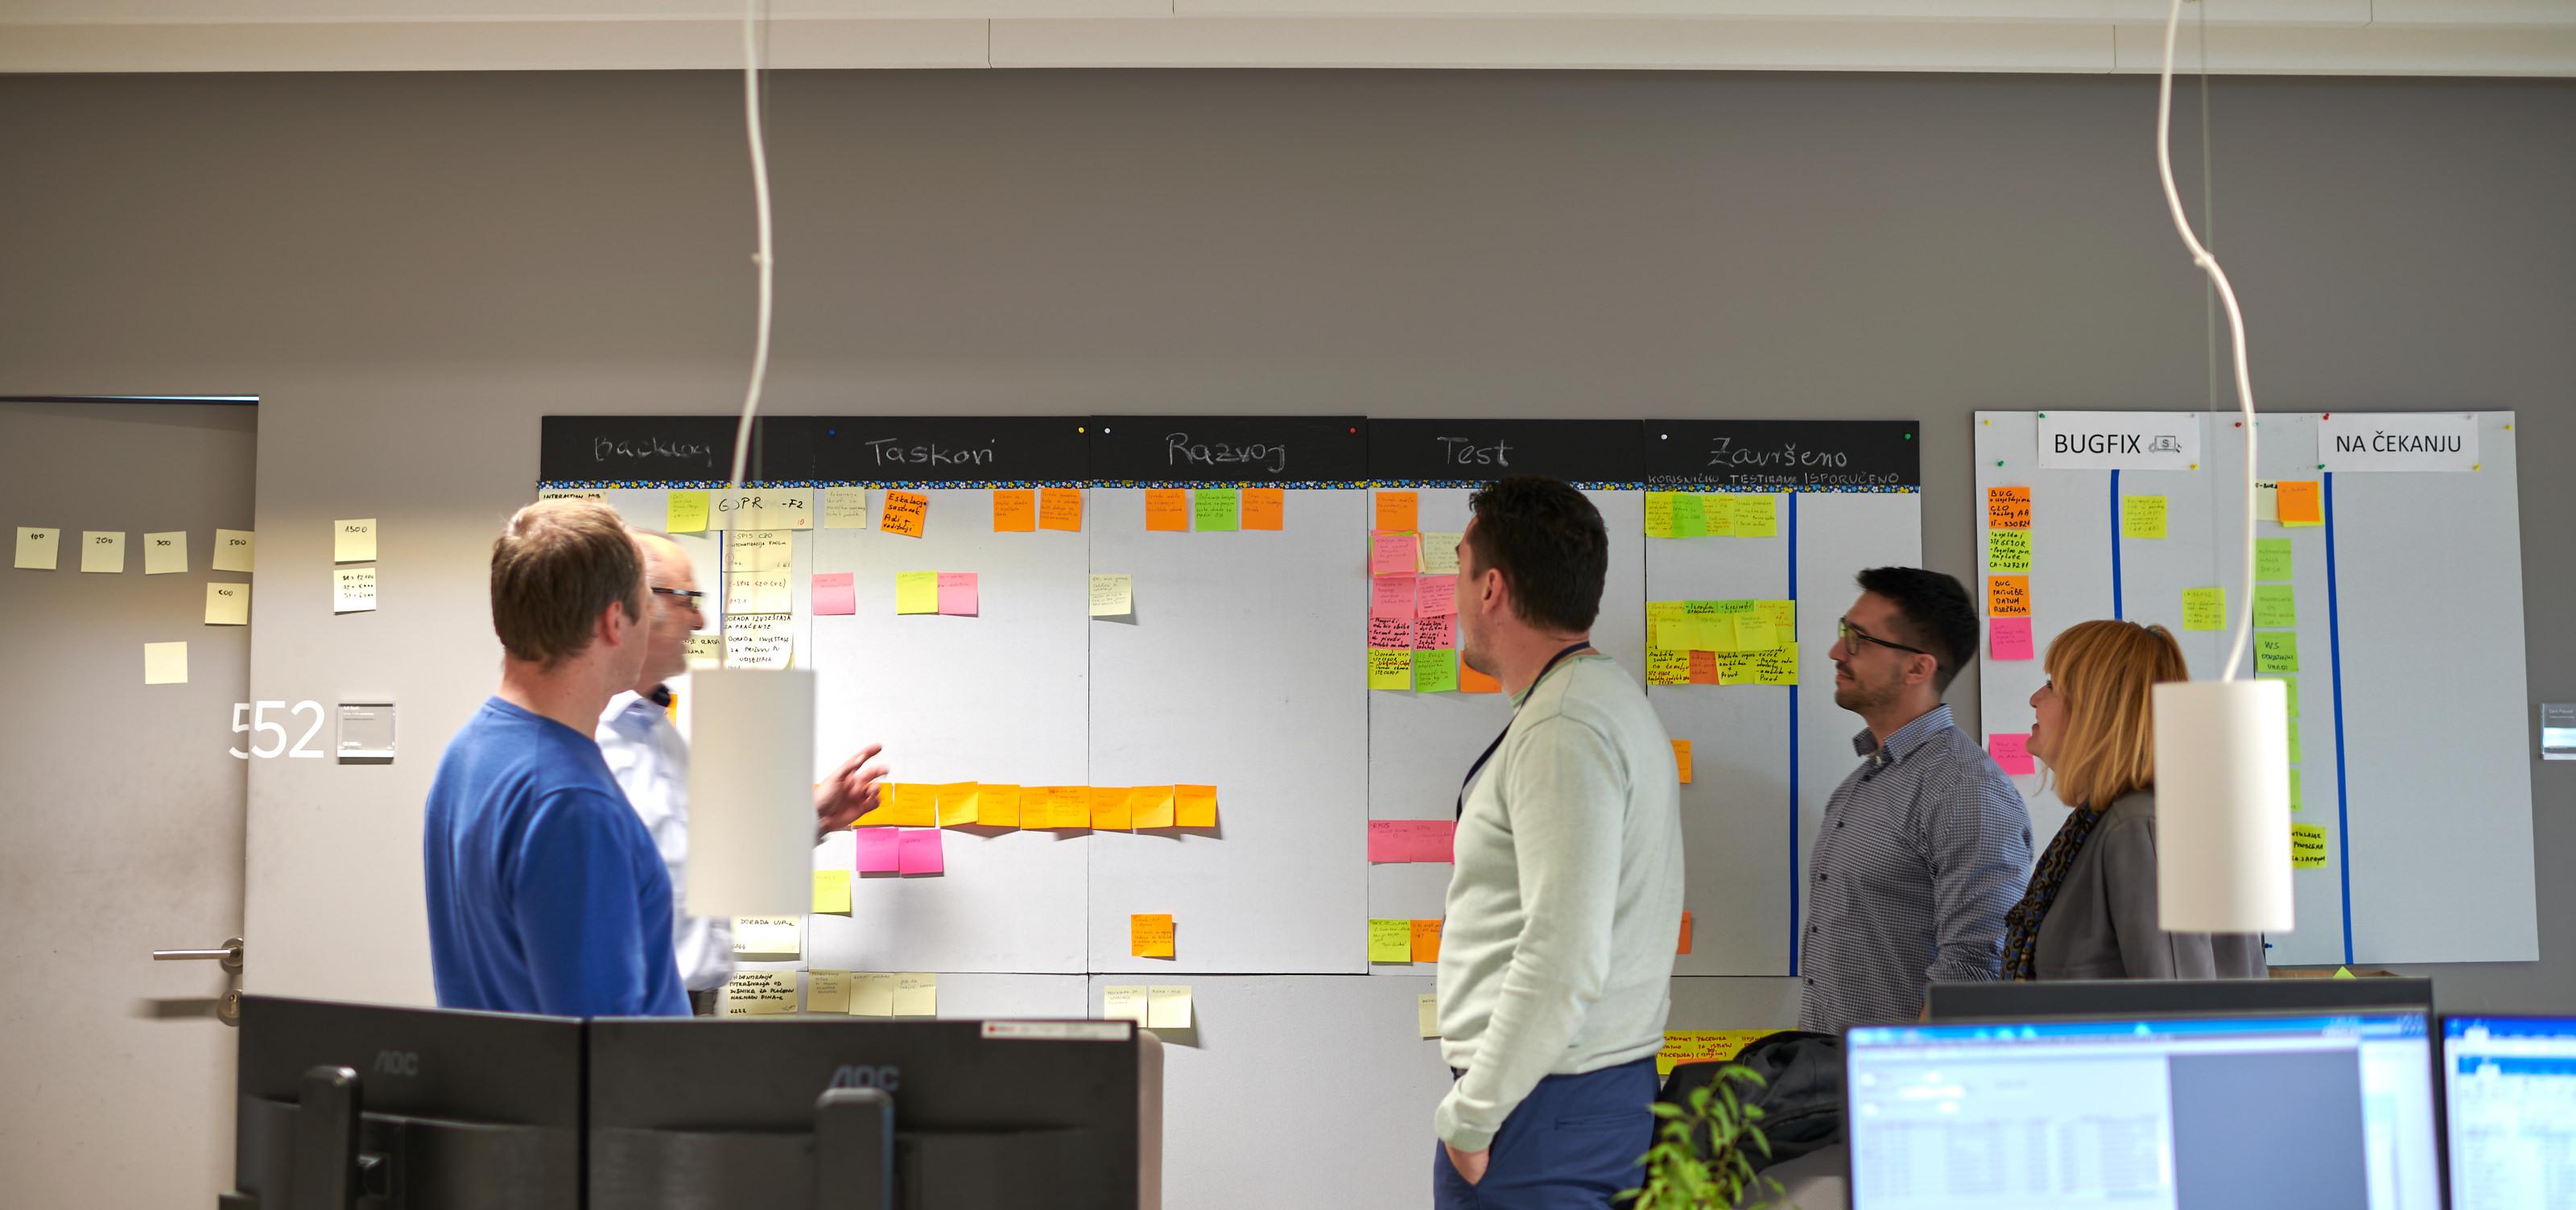 Croatia osiguranje- Agile Coaching for ASW Department